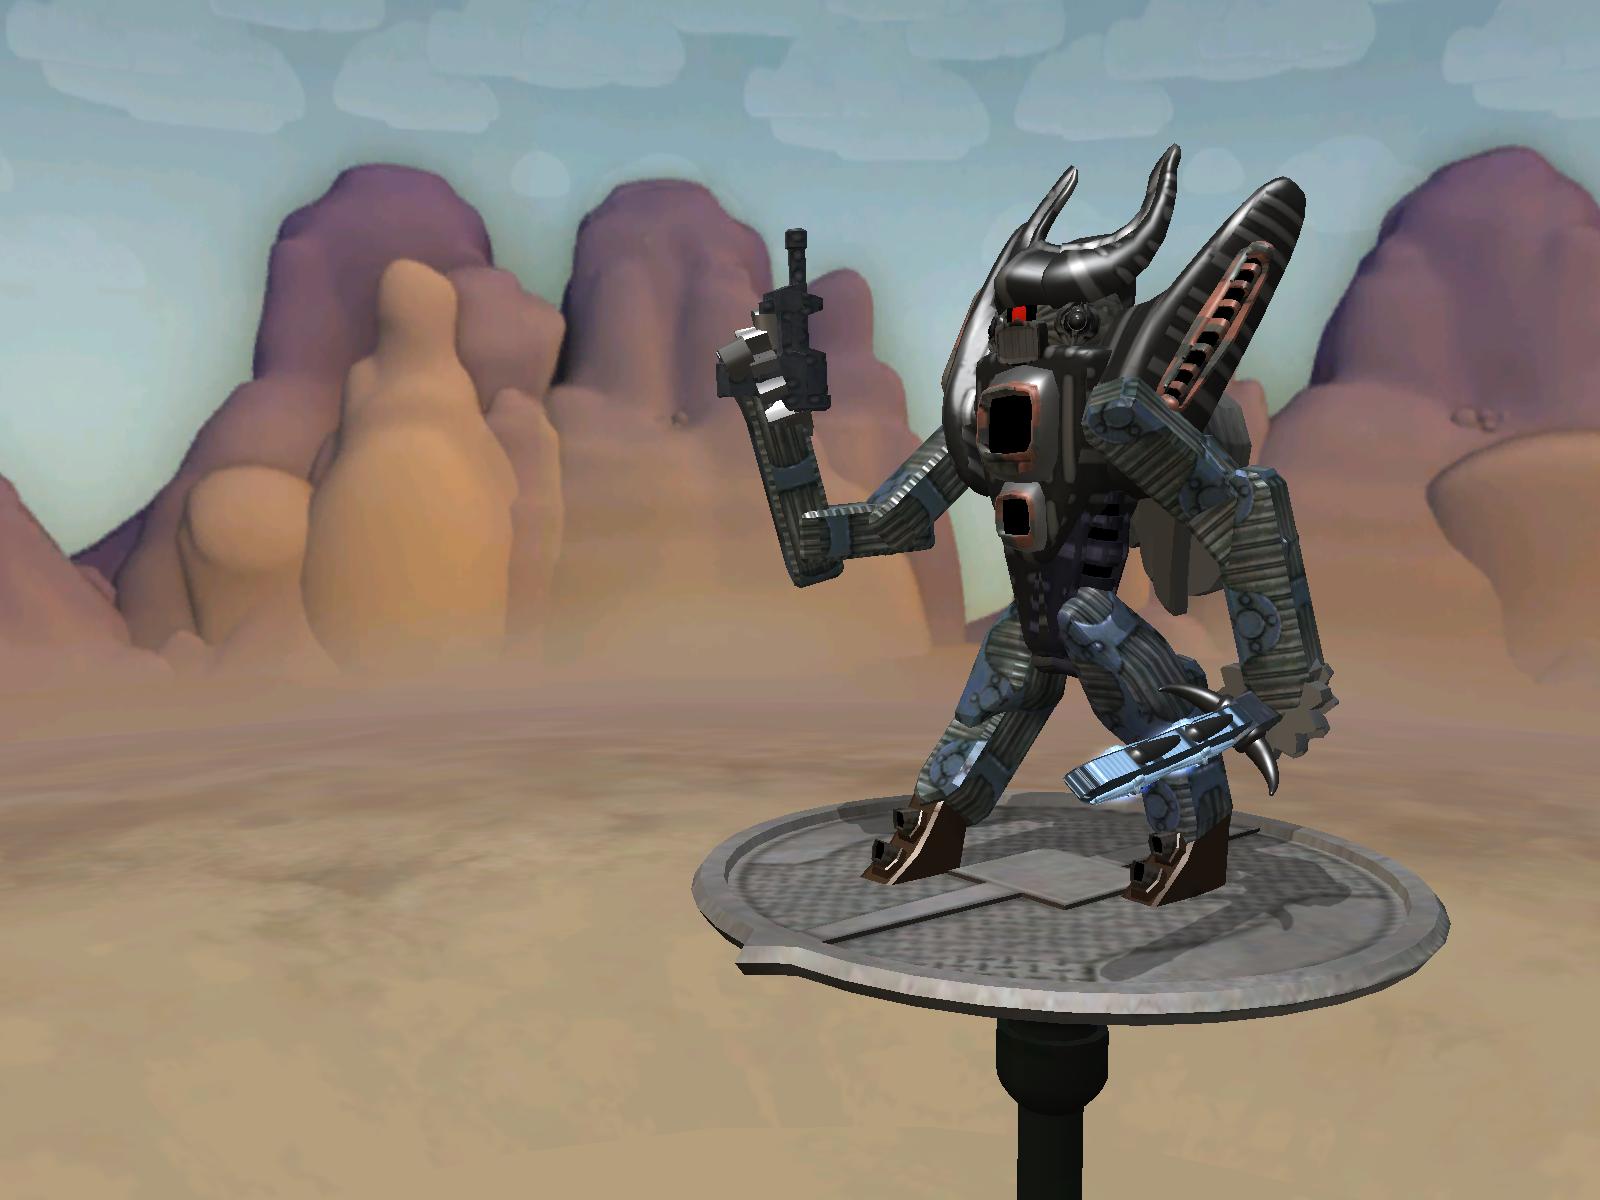 Juguete Navideño: Robot Ekonotria[SN][E] Spore-09-01-2020-01-51-01